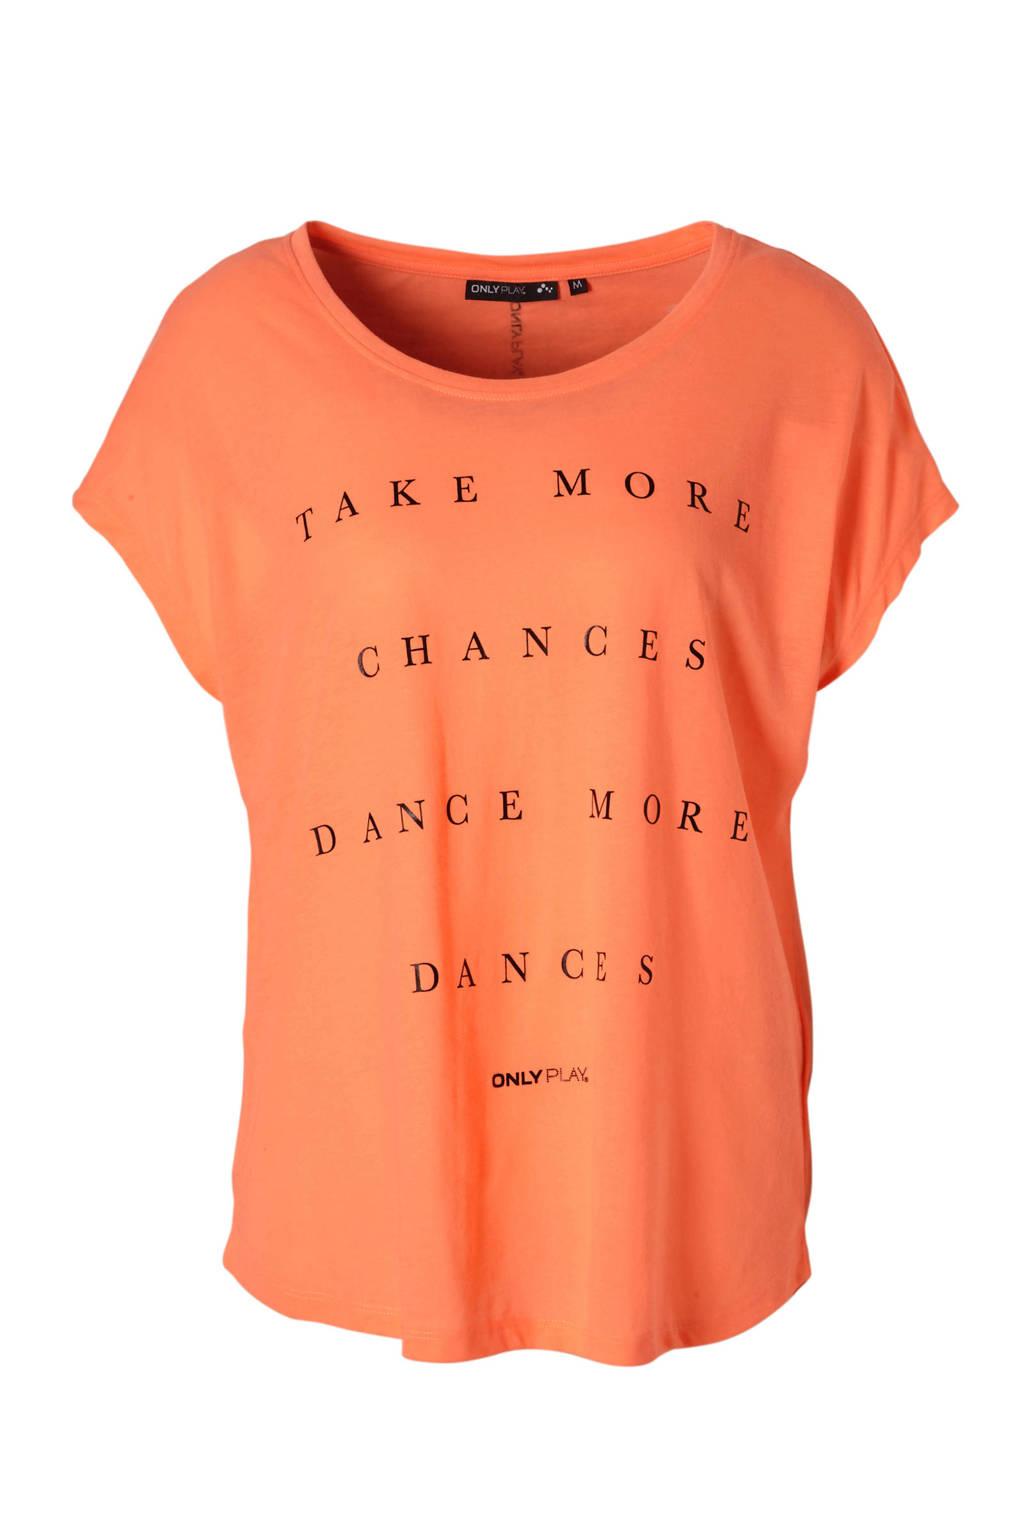 ONLY PLAY sport T-shirt neon oranje, neon oranje/zwart